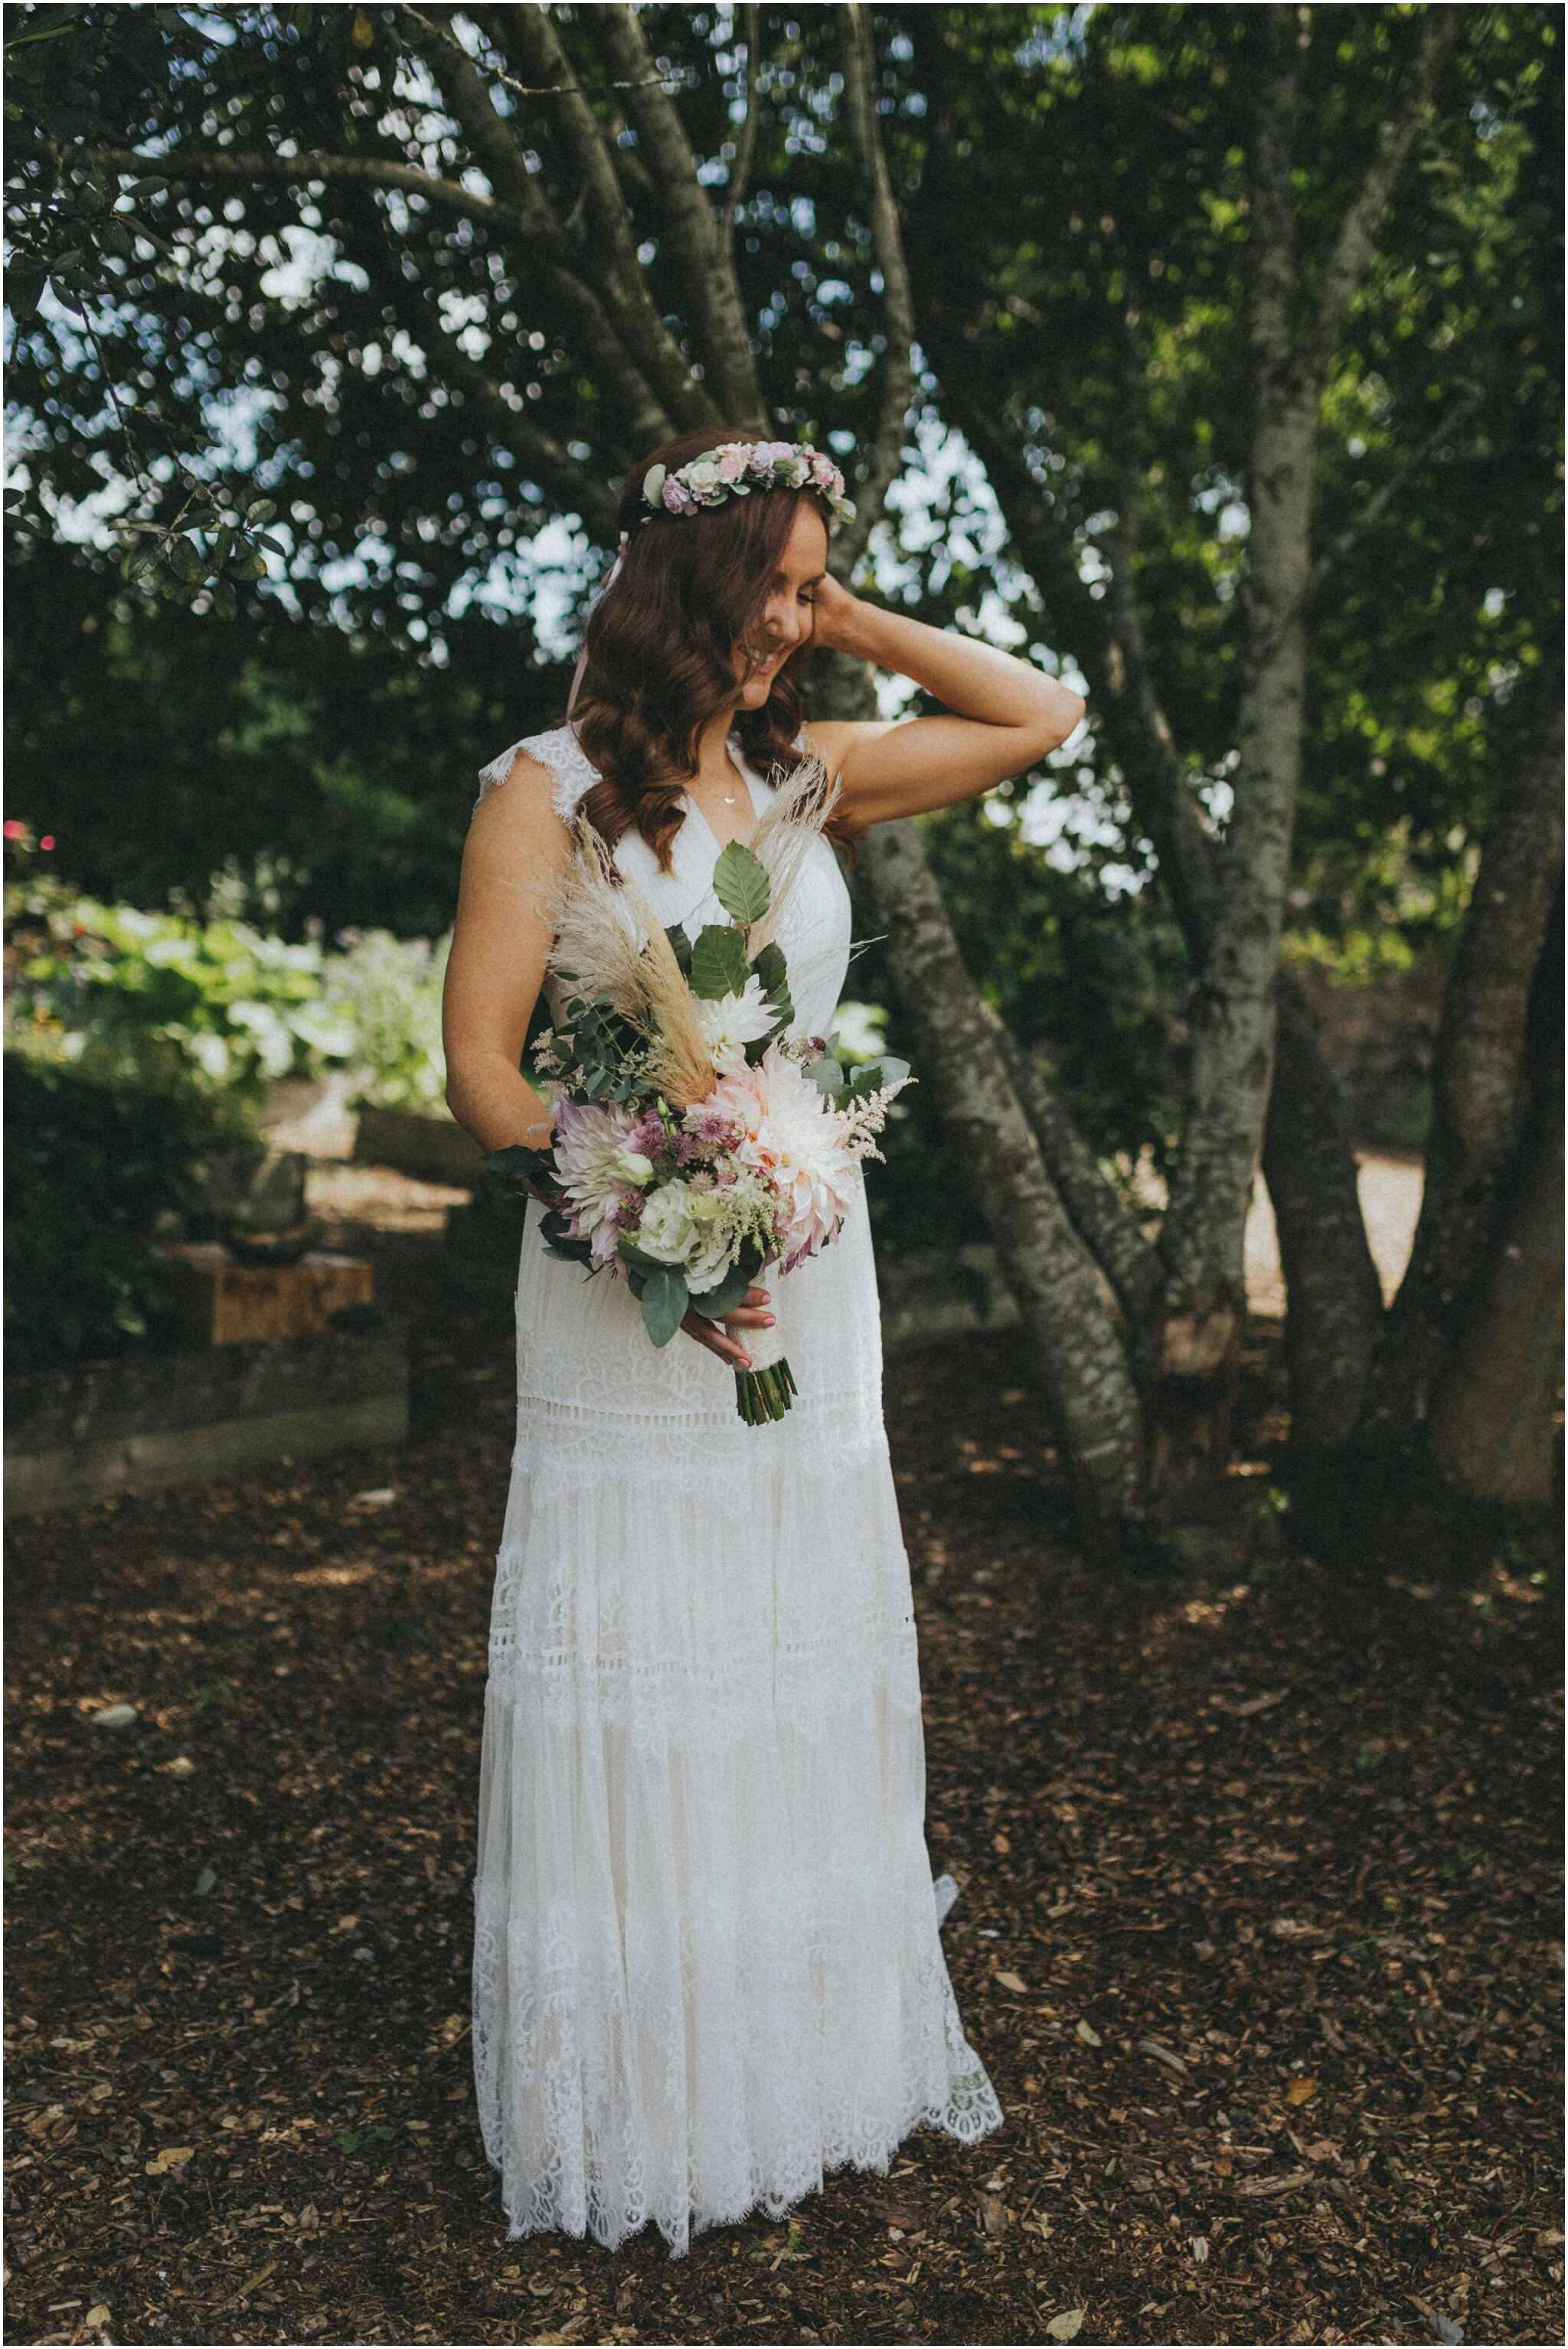 Fionnuala + Paul - Mount Druid Alternative Wedding 58